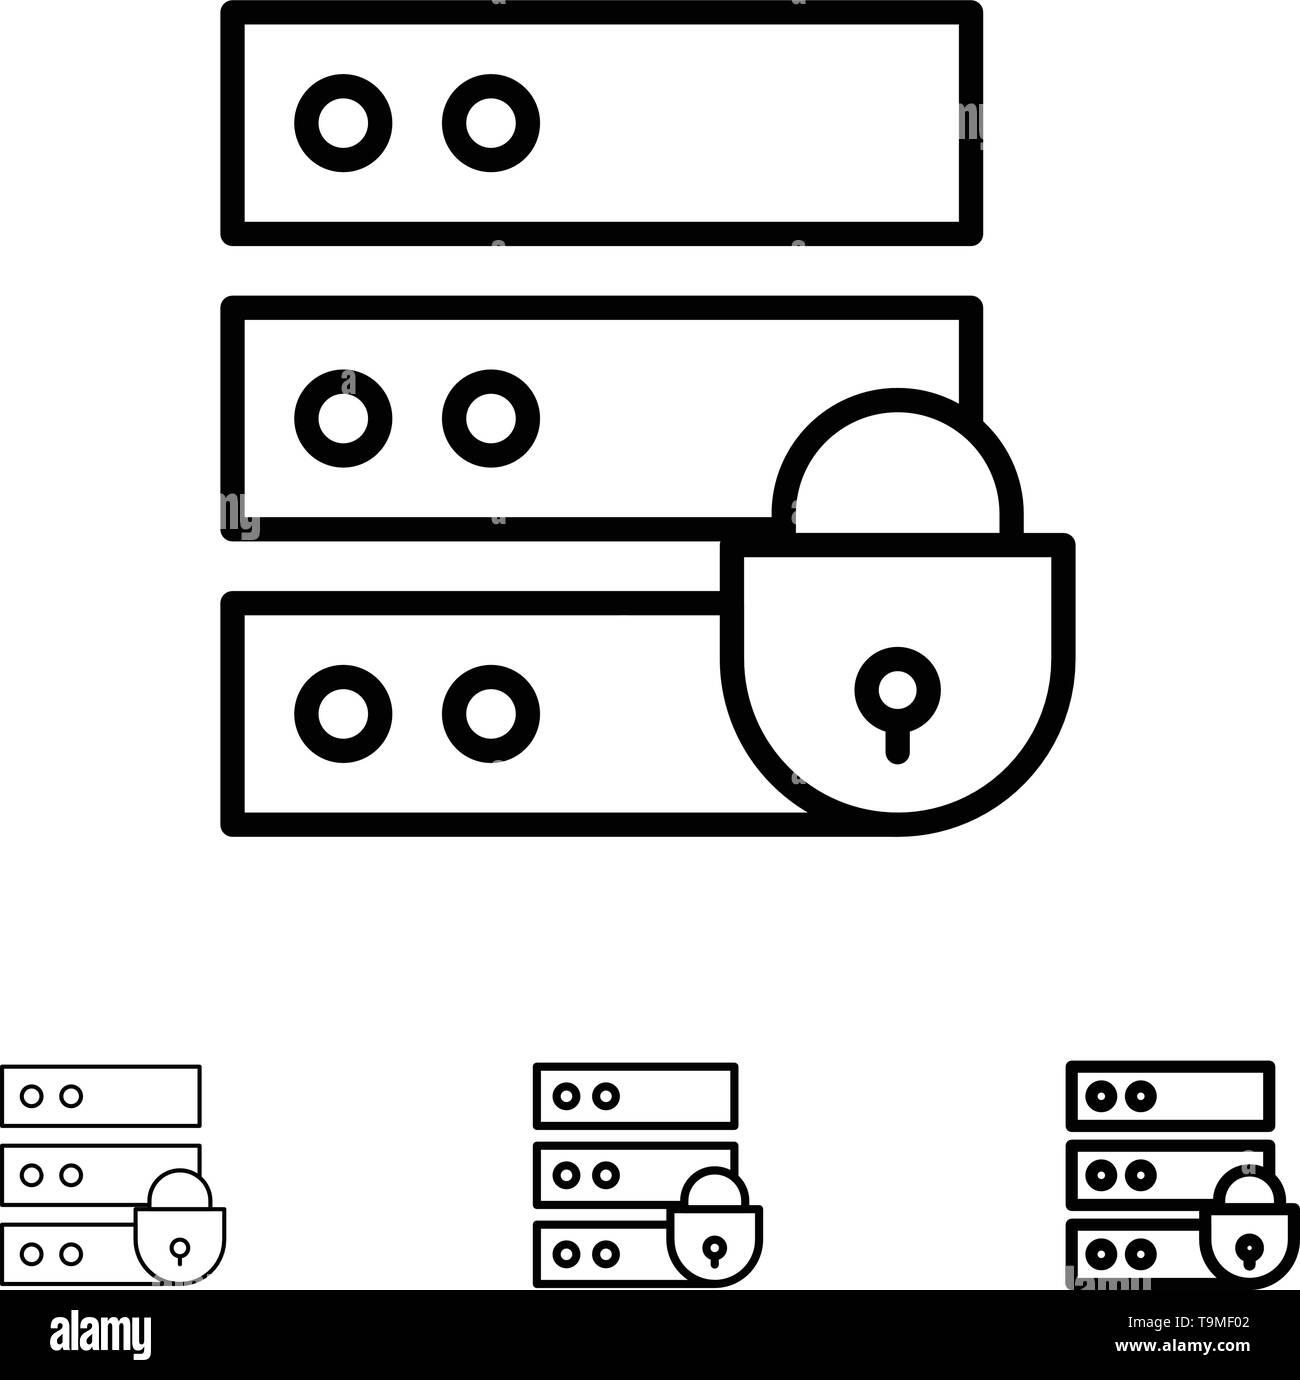 Device, Electronic, Internet Security, Key Bold and thin black line icon set - Stock Image